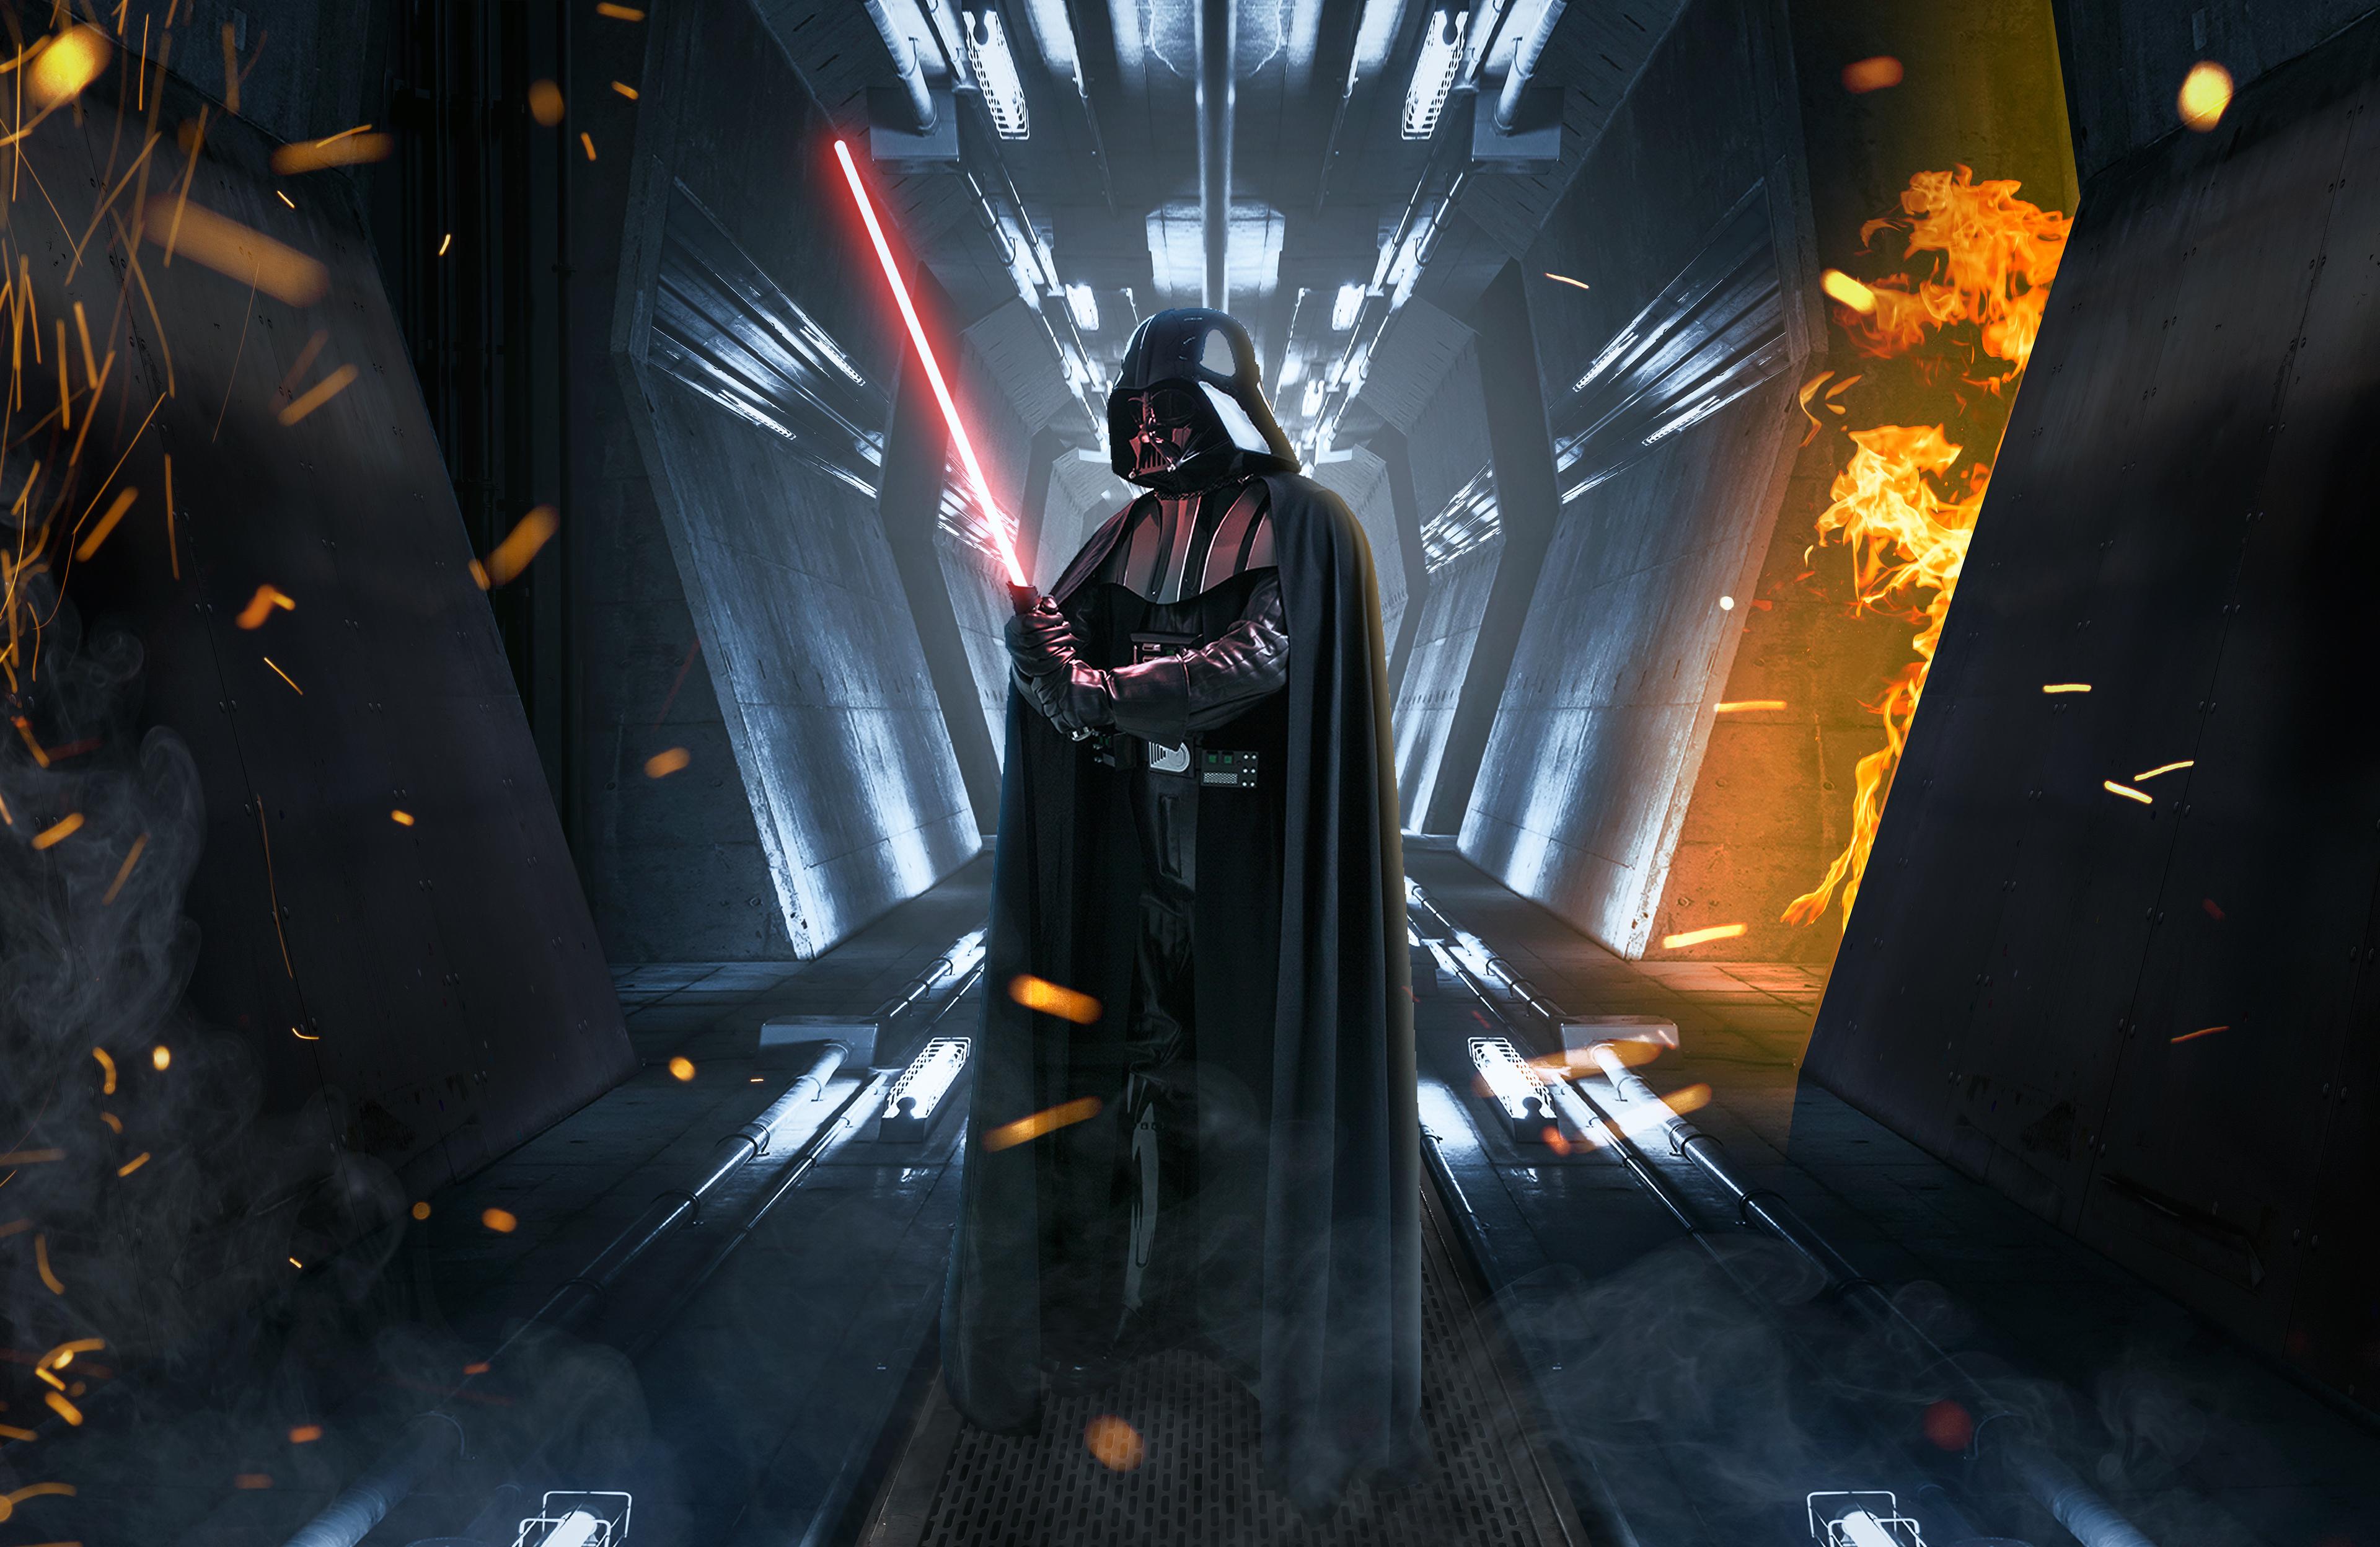 darth vader 1589578772 - Darth Vader - darth vader wallpapers, Darth Vader 4k wallpapers